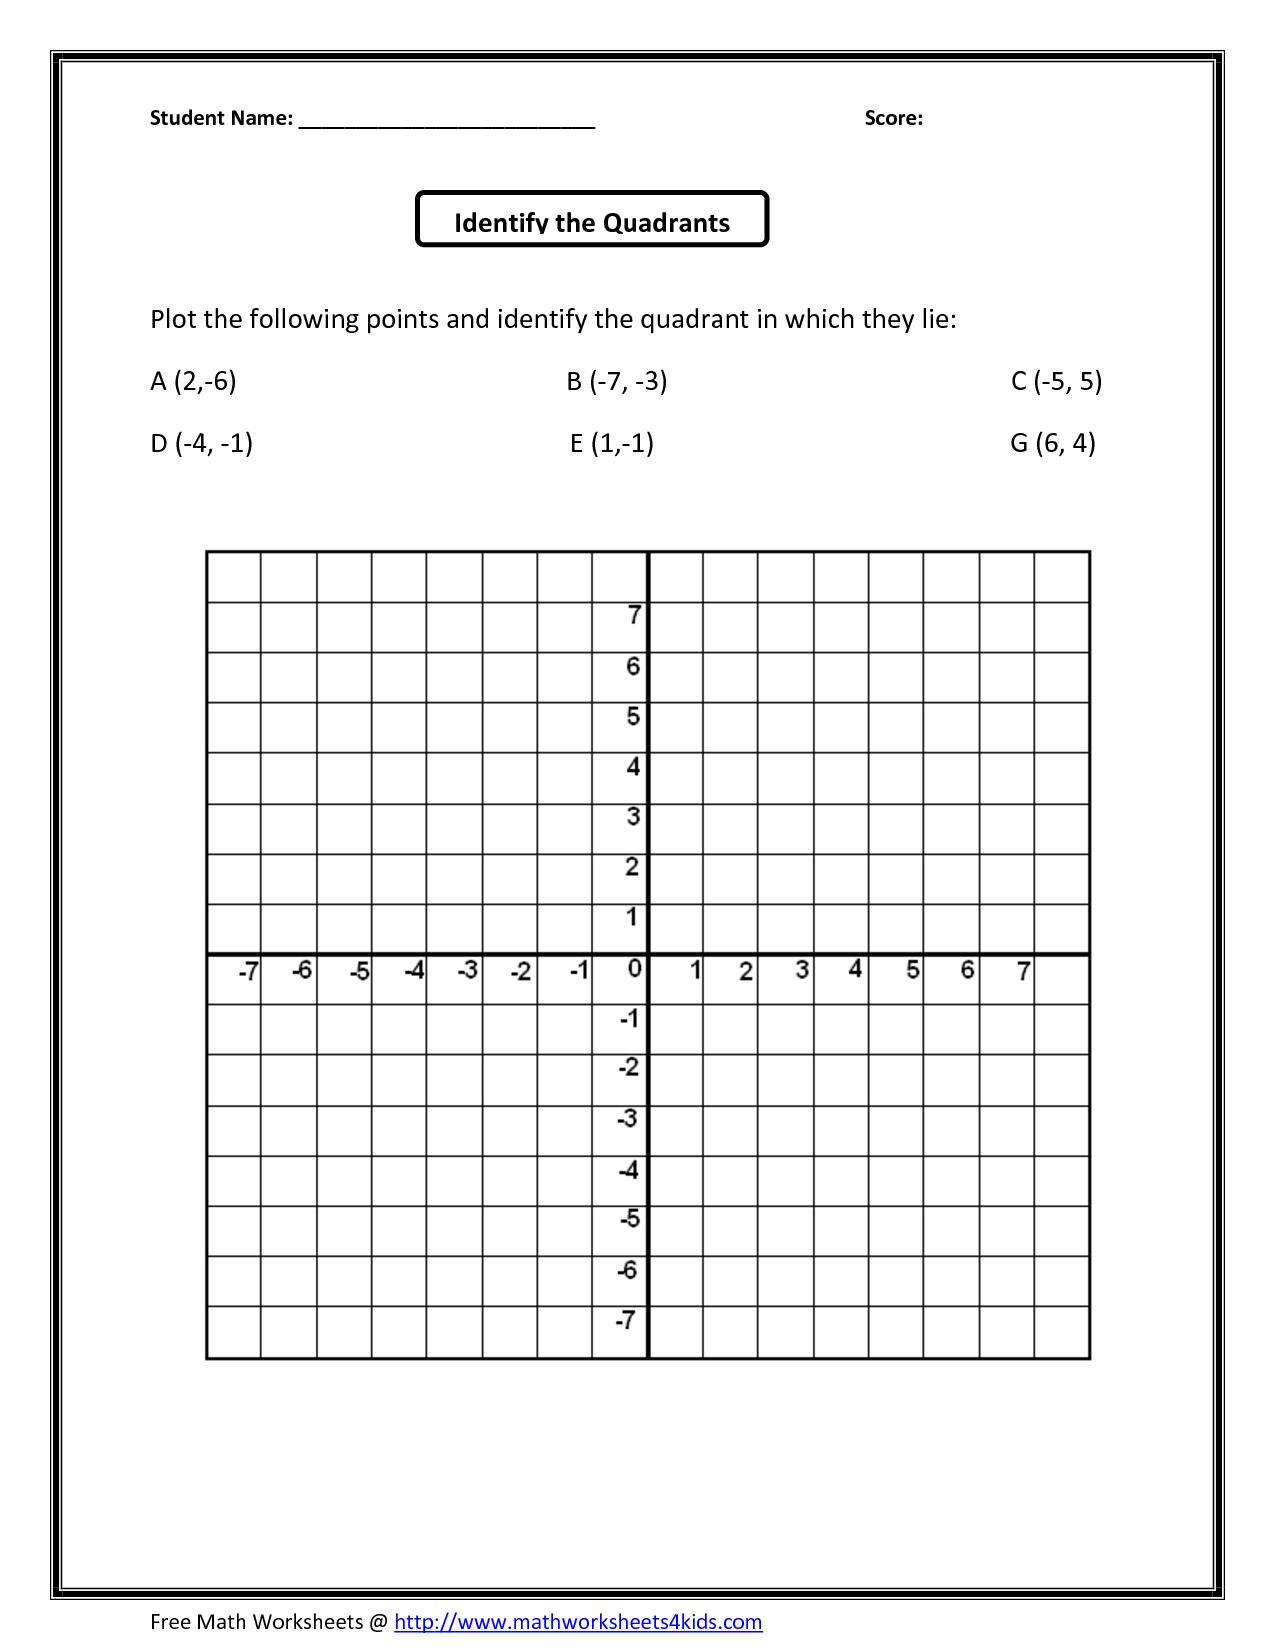 Math : Coordinate Plane Grid Coordinate Template 0 To 12 2 - Free Printable Coordinate Grid Worksheets